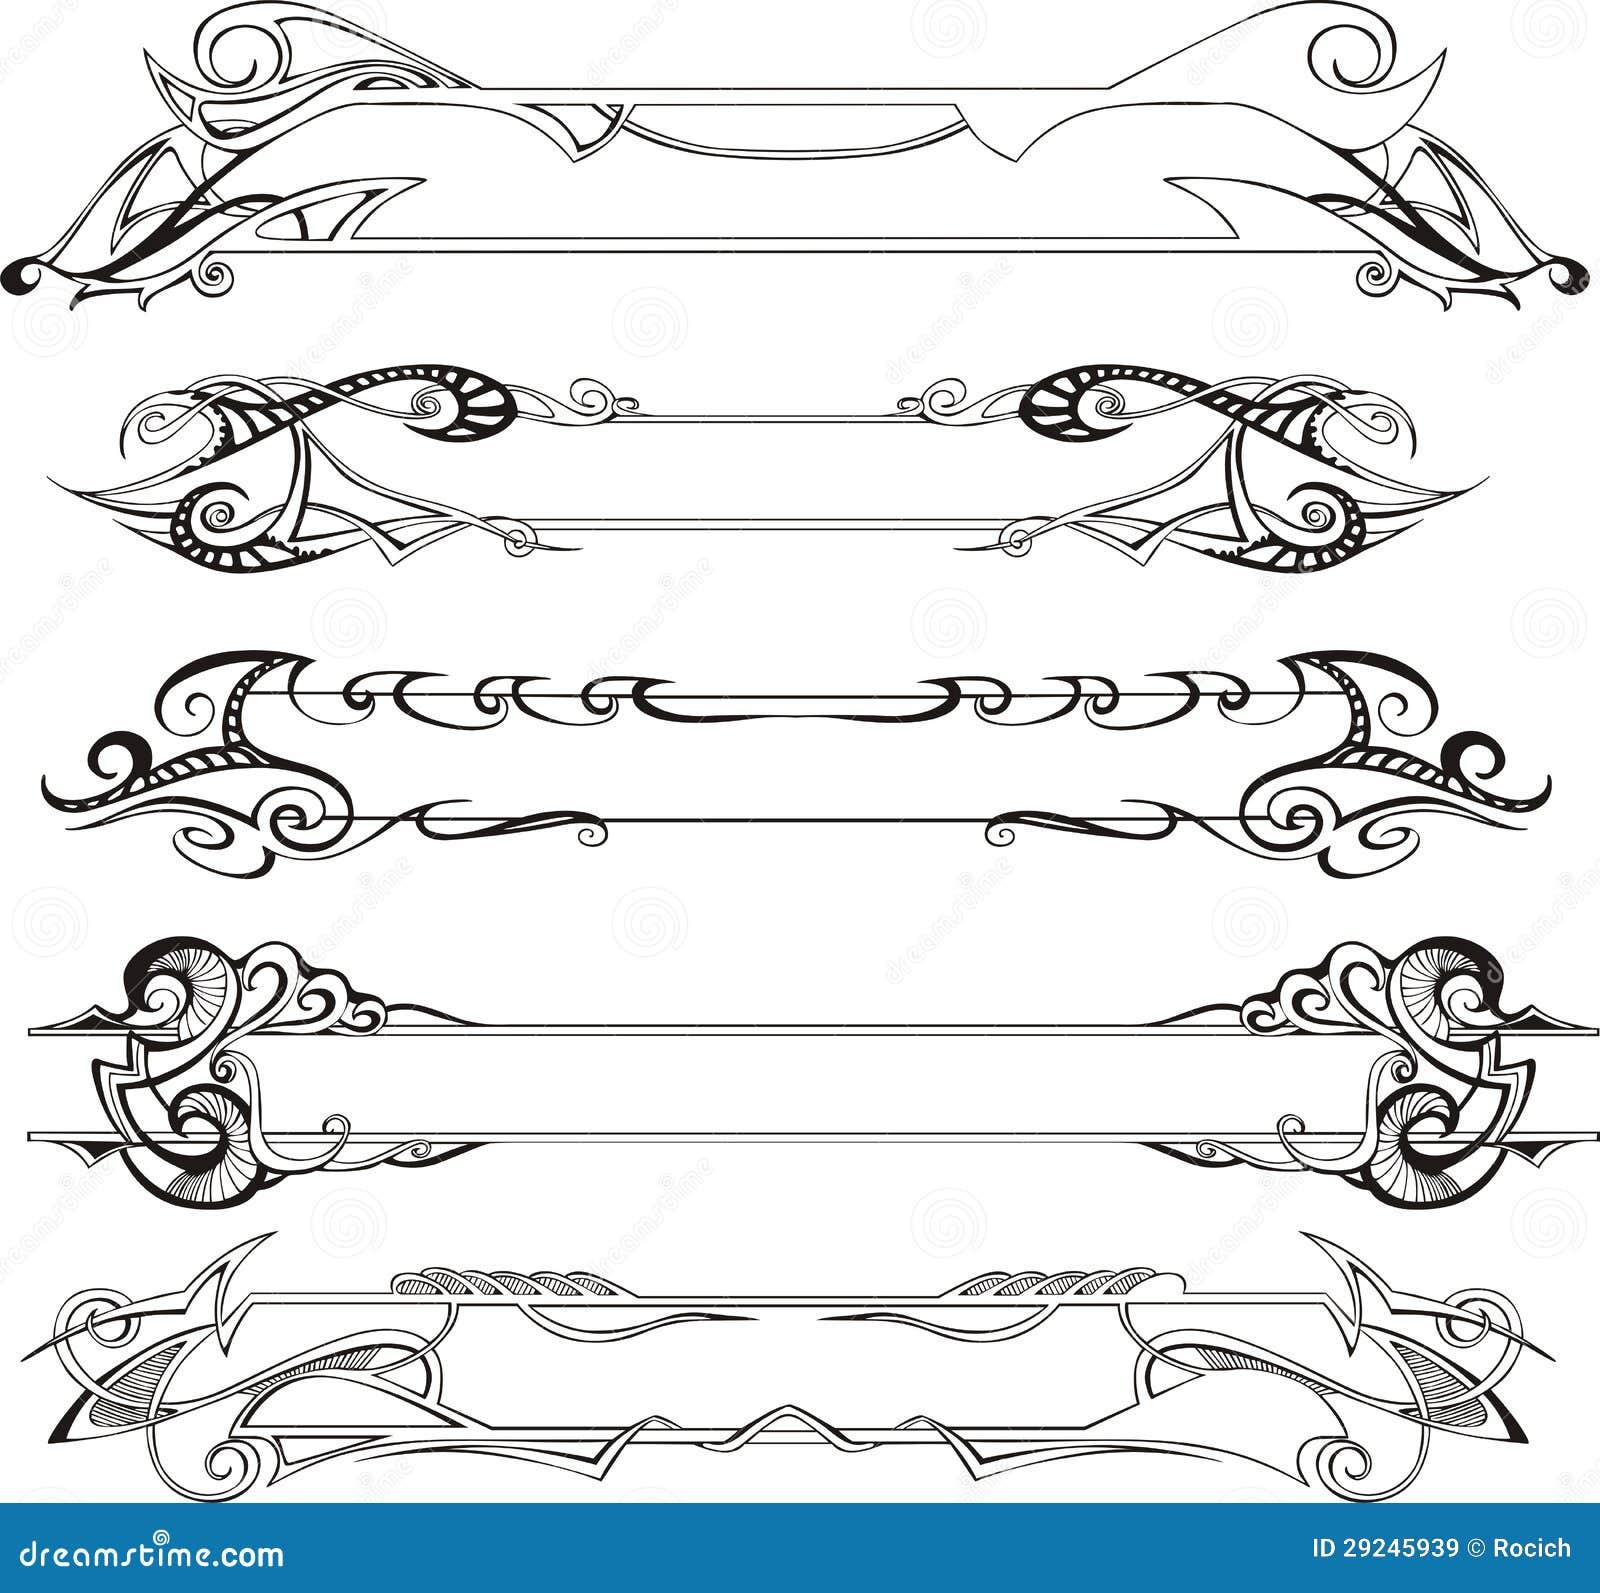 slim decorative frames - Decorative Frames